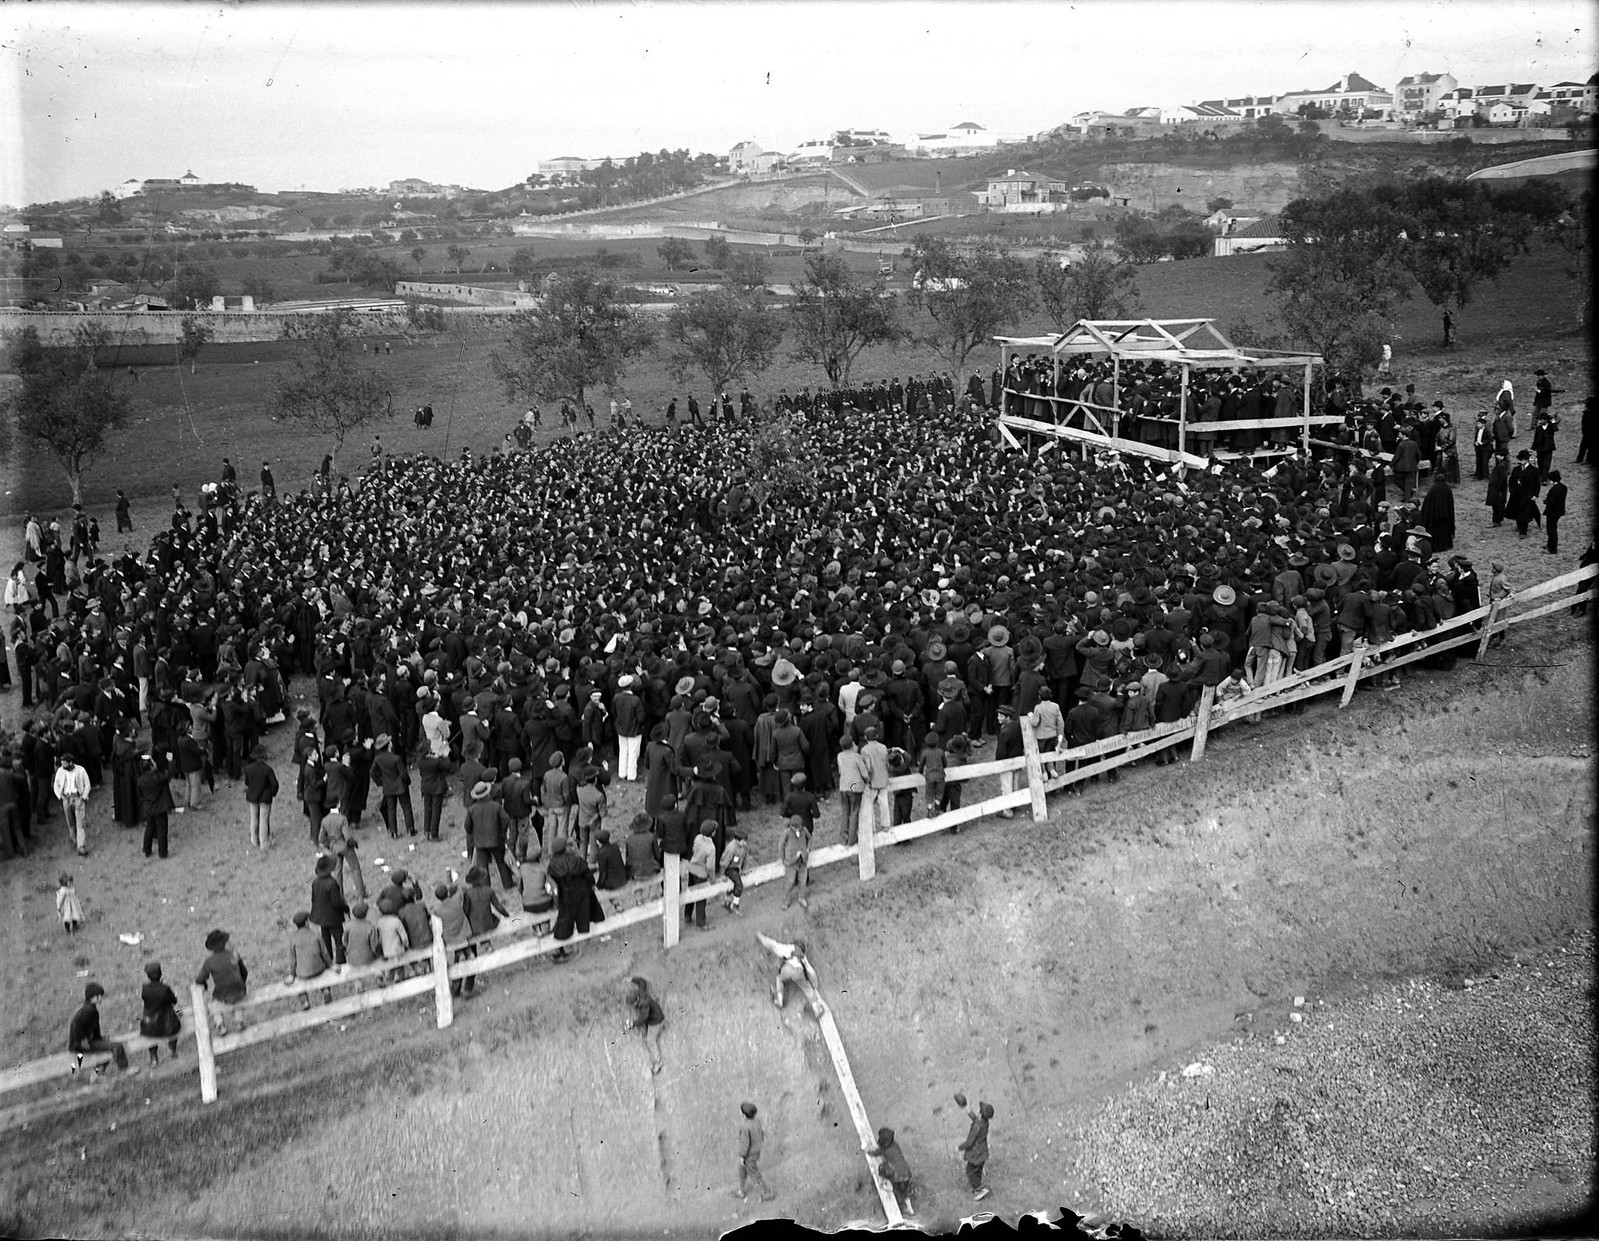 Comício republicano, Arroios, 1907 (A.F.C.M.L.)